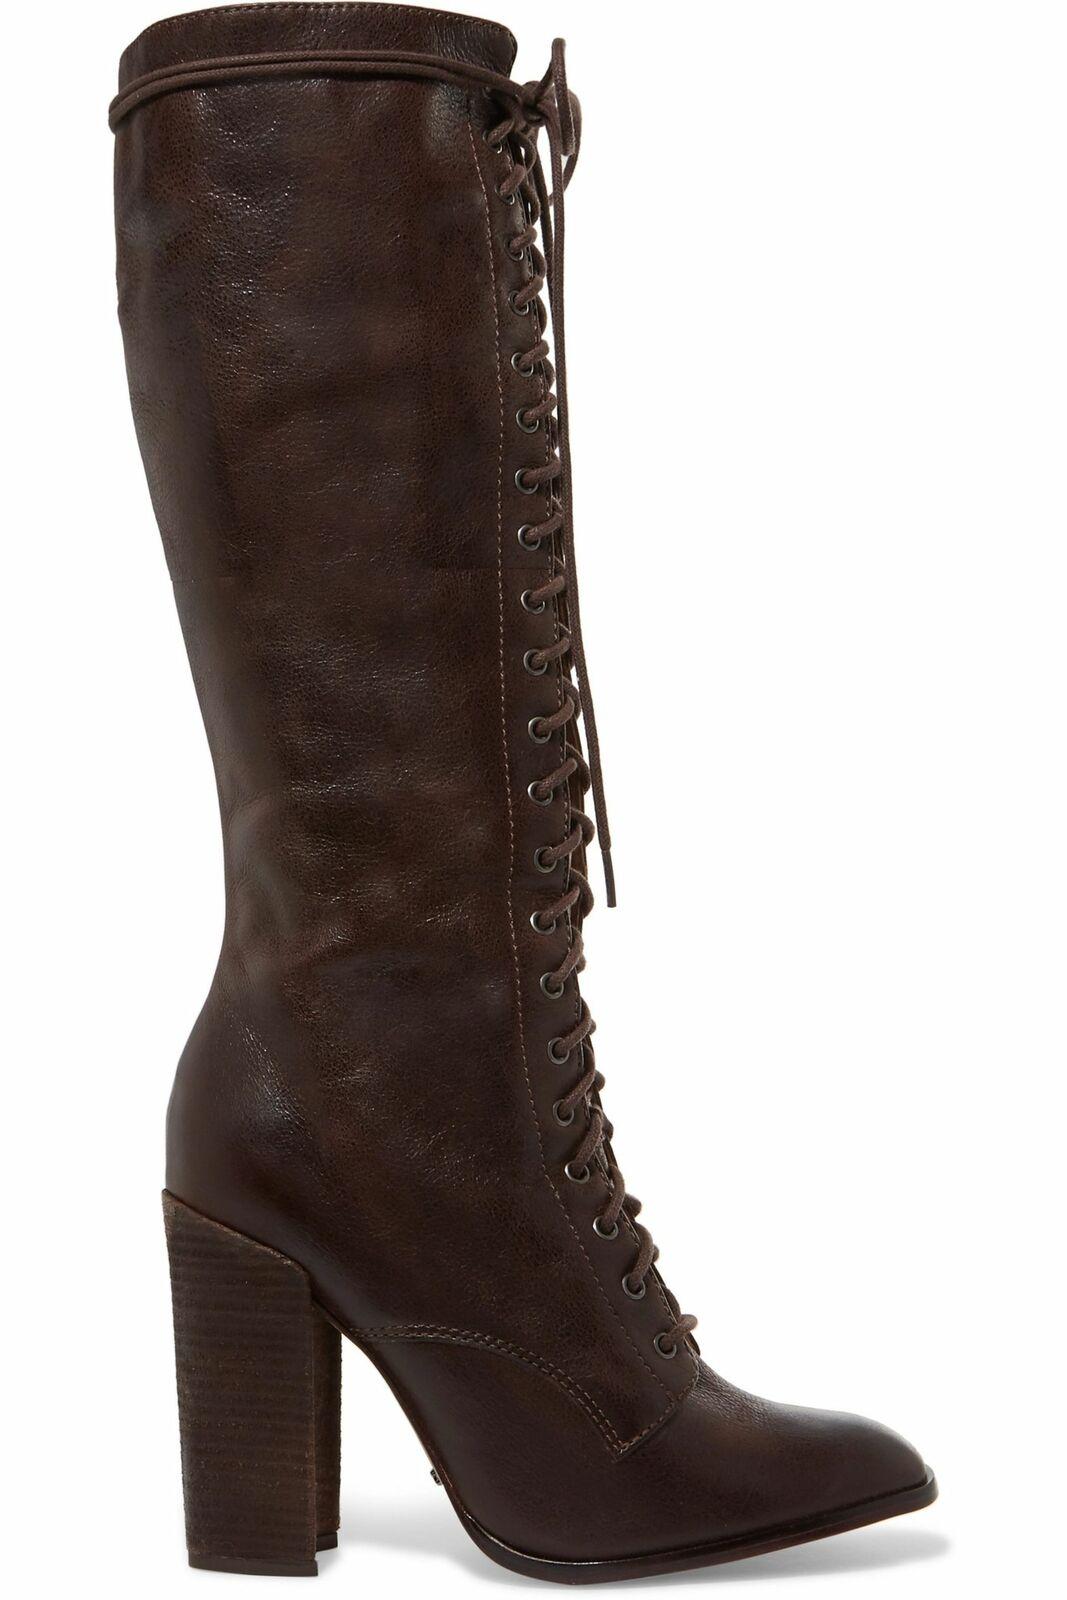 Schutz Cola Cola Cola Brown Leather Lace Up Knee High Block Heel Combat Dress Boots 1c88b4